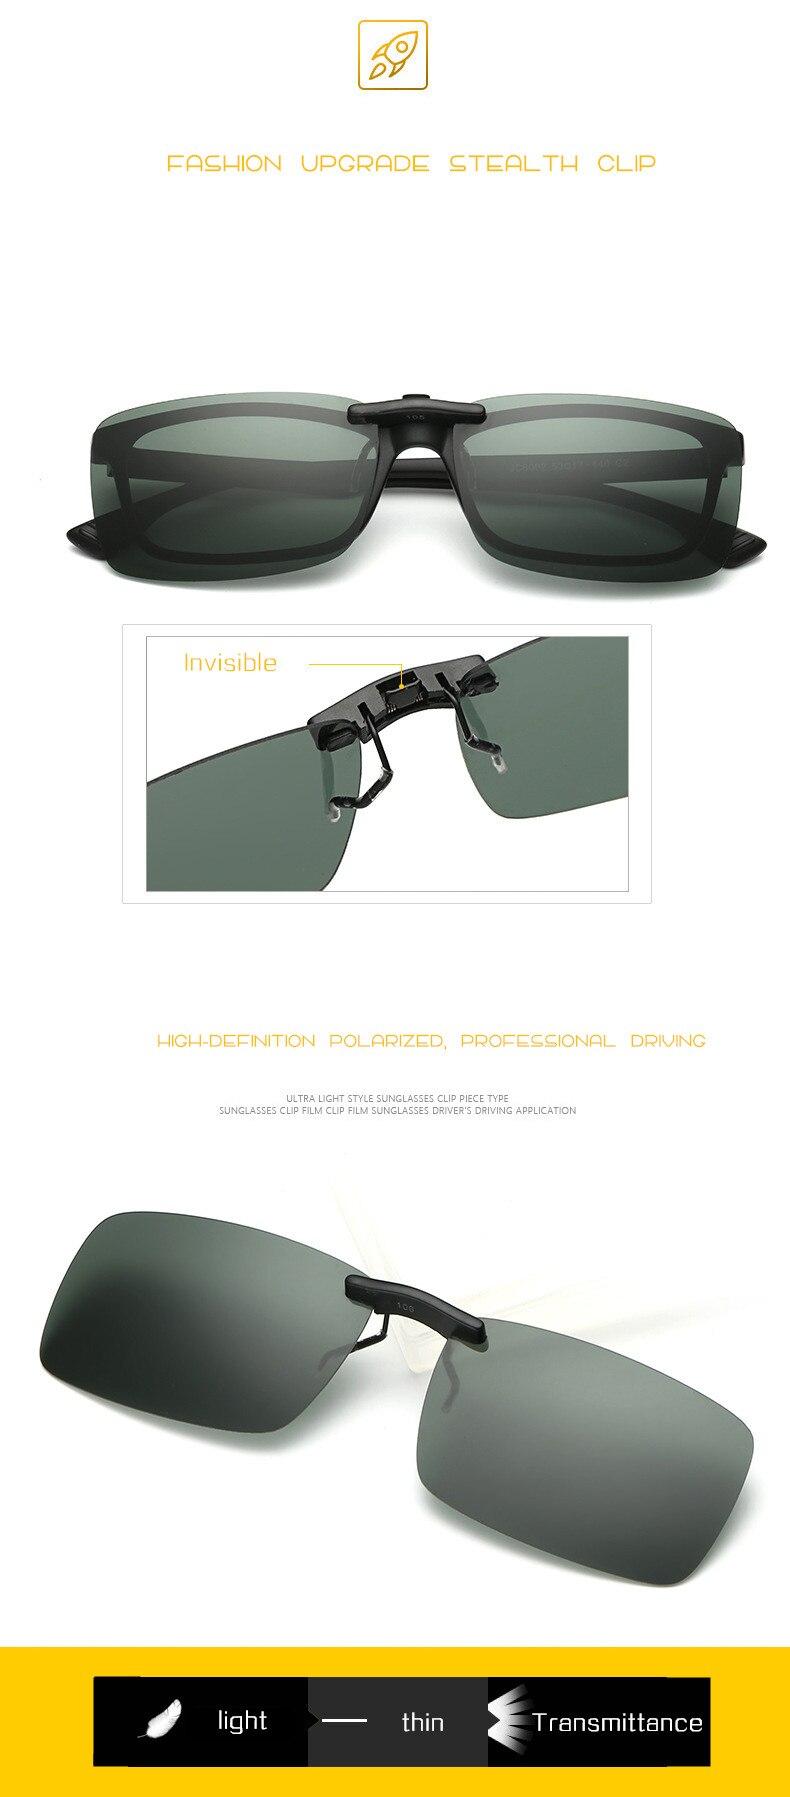 2130f2c9be4 Classic Polarized Lenses Sunglasses Clip on Myopia Glasses Rimless Men  Women Night Vision Driving Sunglasses Flip on Glasses